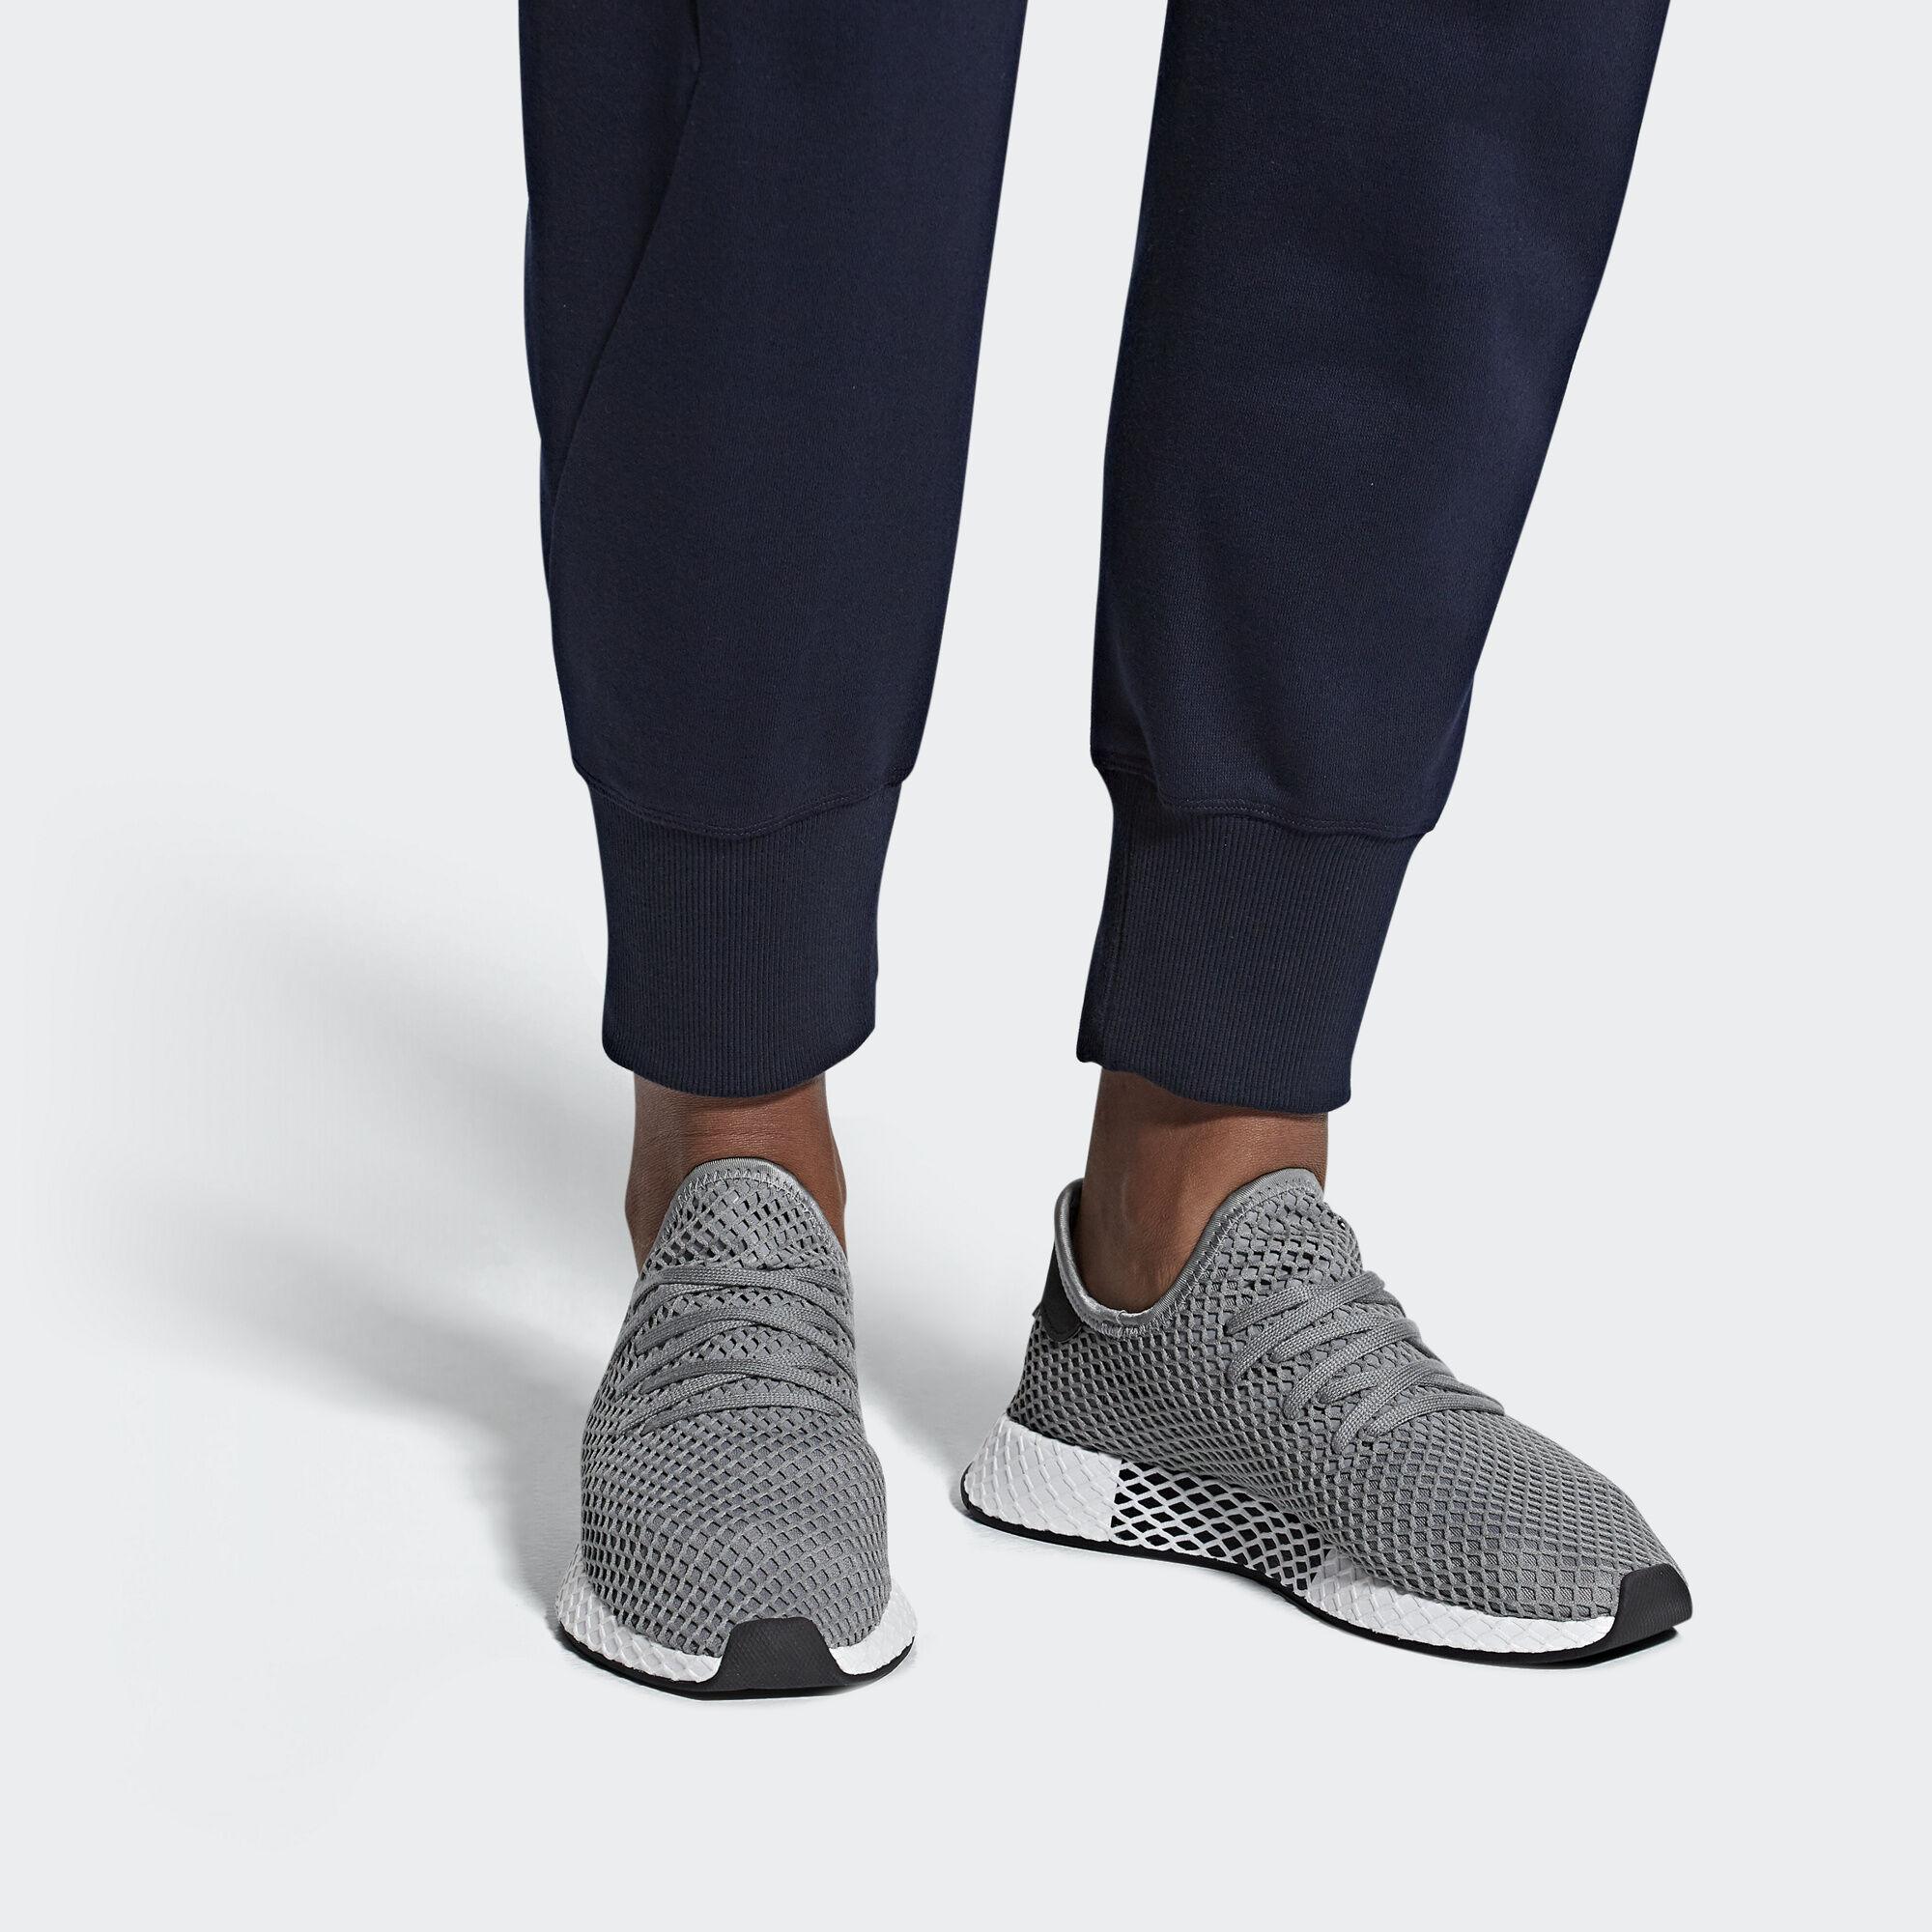 online store 1041c d31f6 Zapatilla Deerupt Runner - Turquesa adidas  adidas España